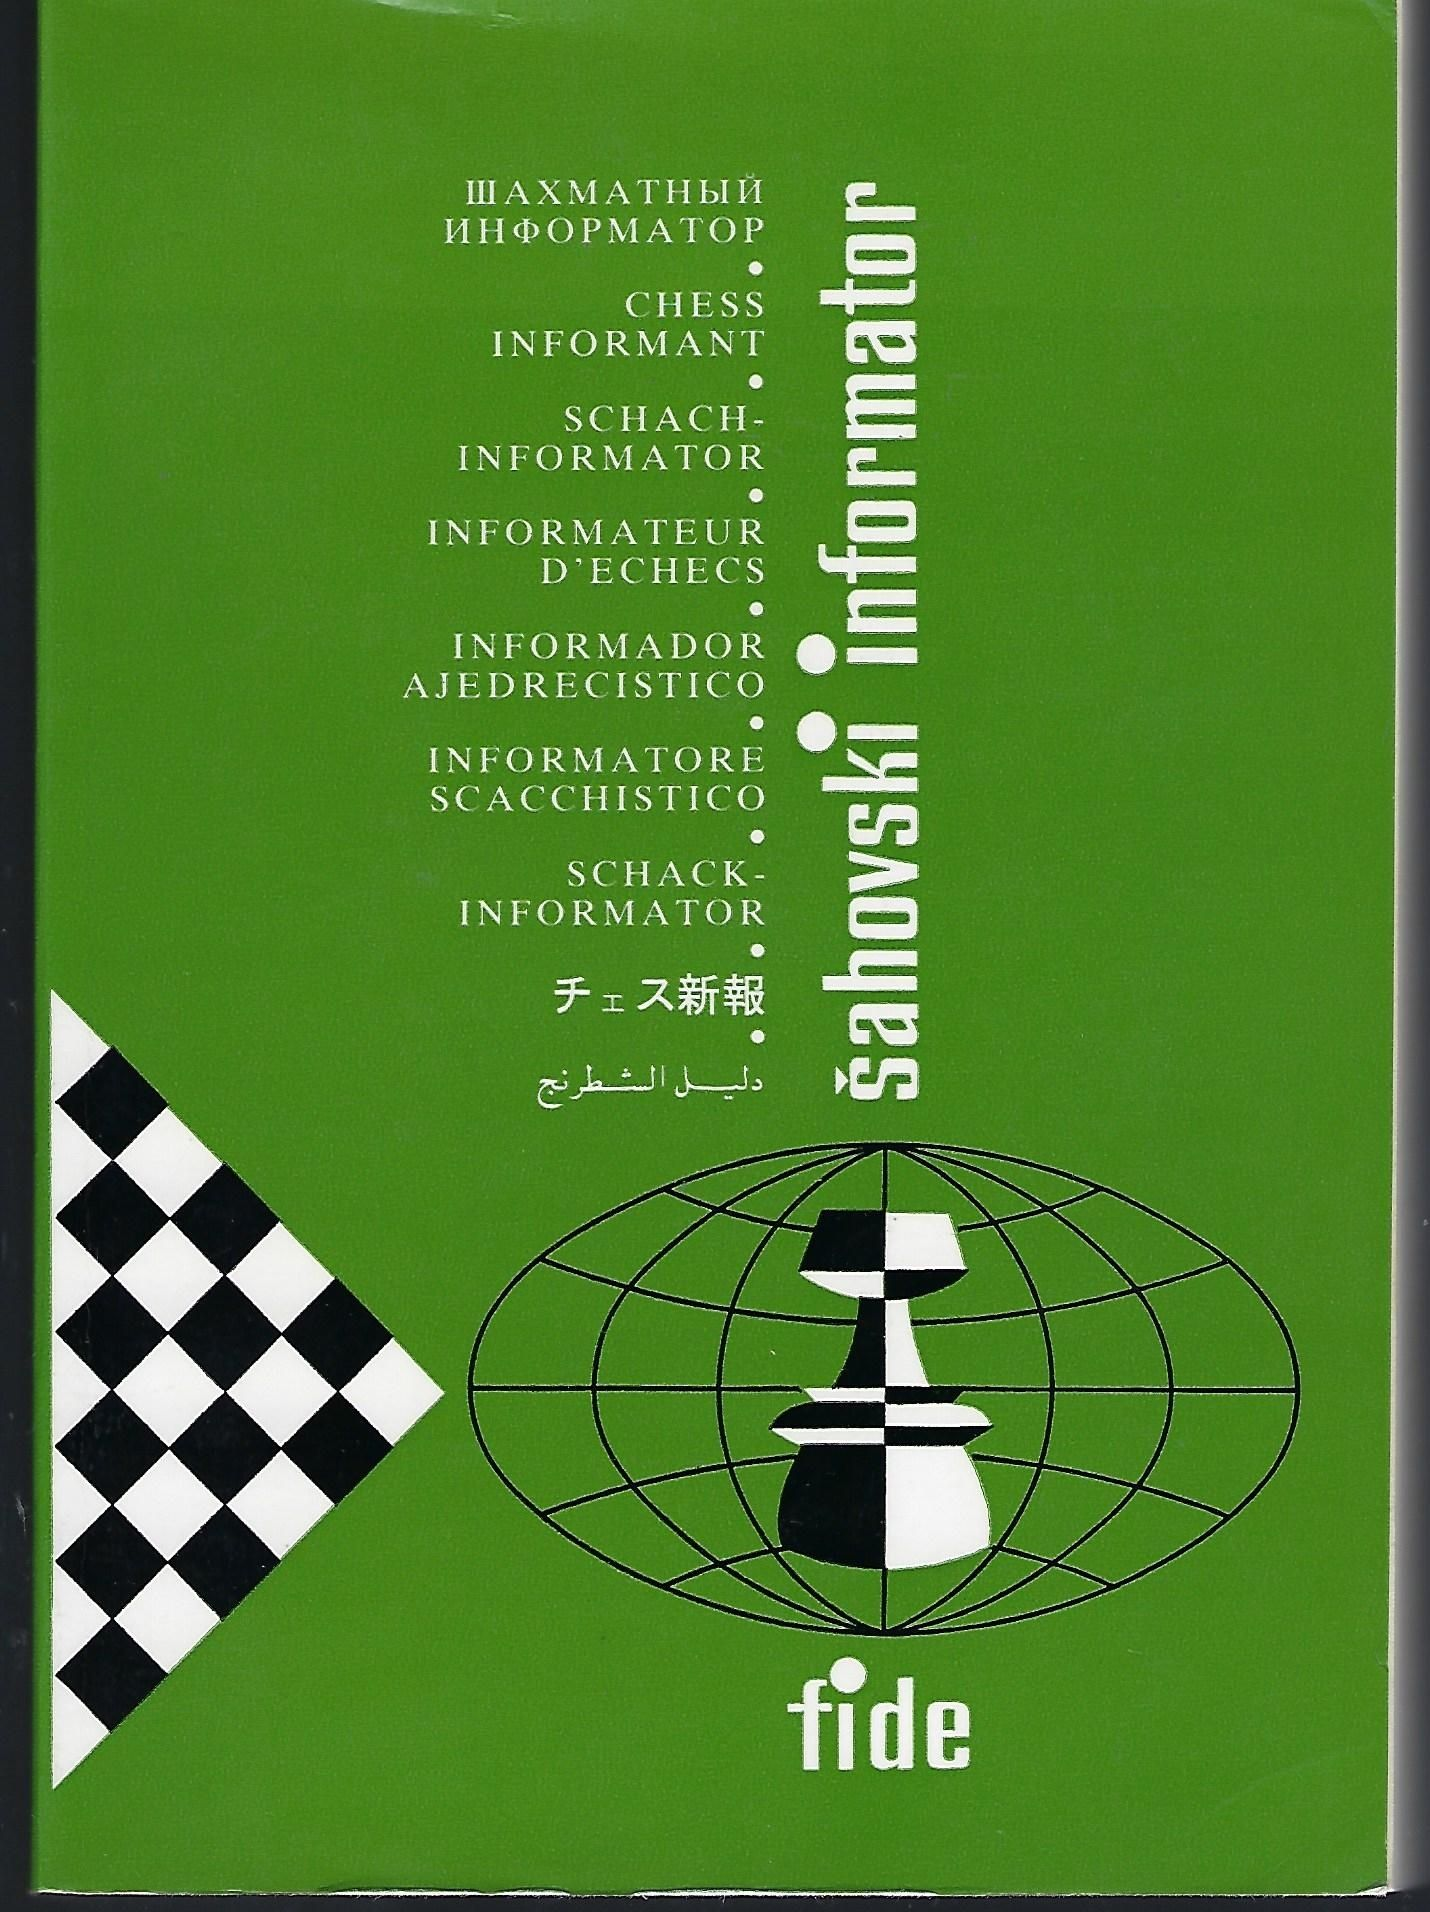 Sahovski Informator 48 Vii Xii 1989 Chess Informant Schach